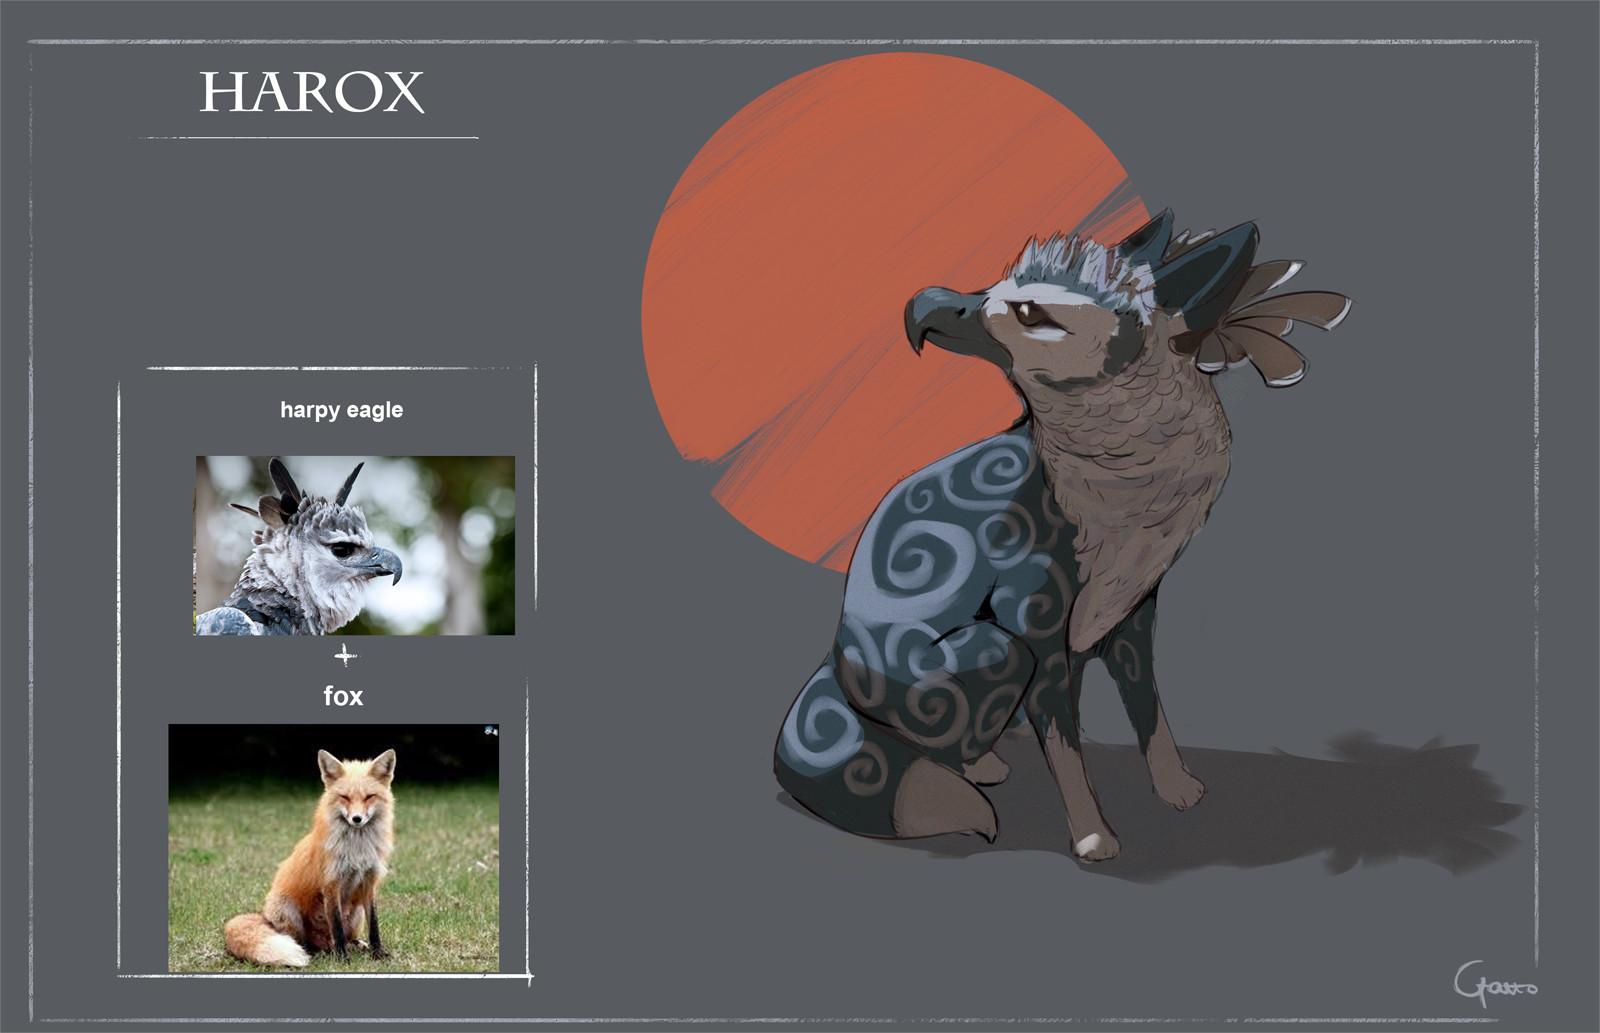 Harox